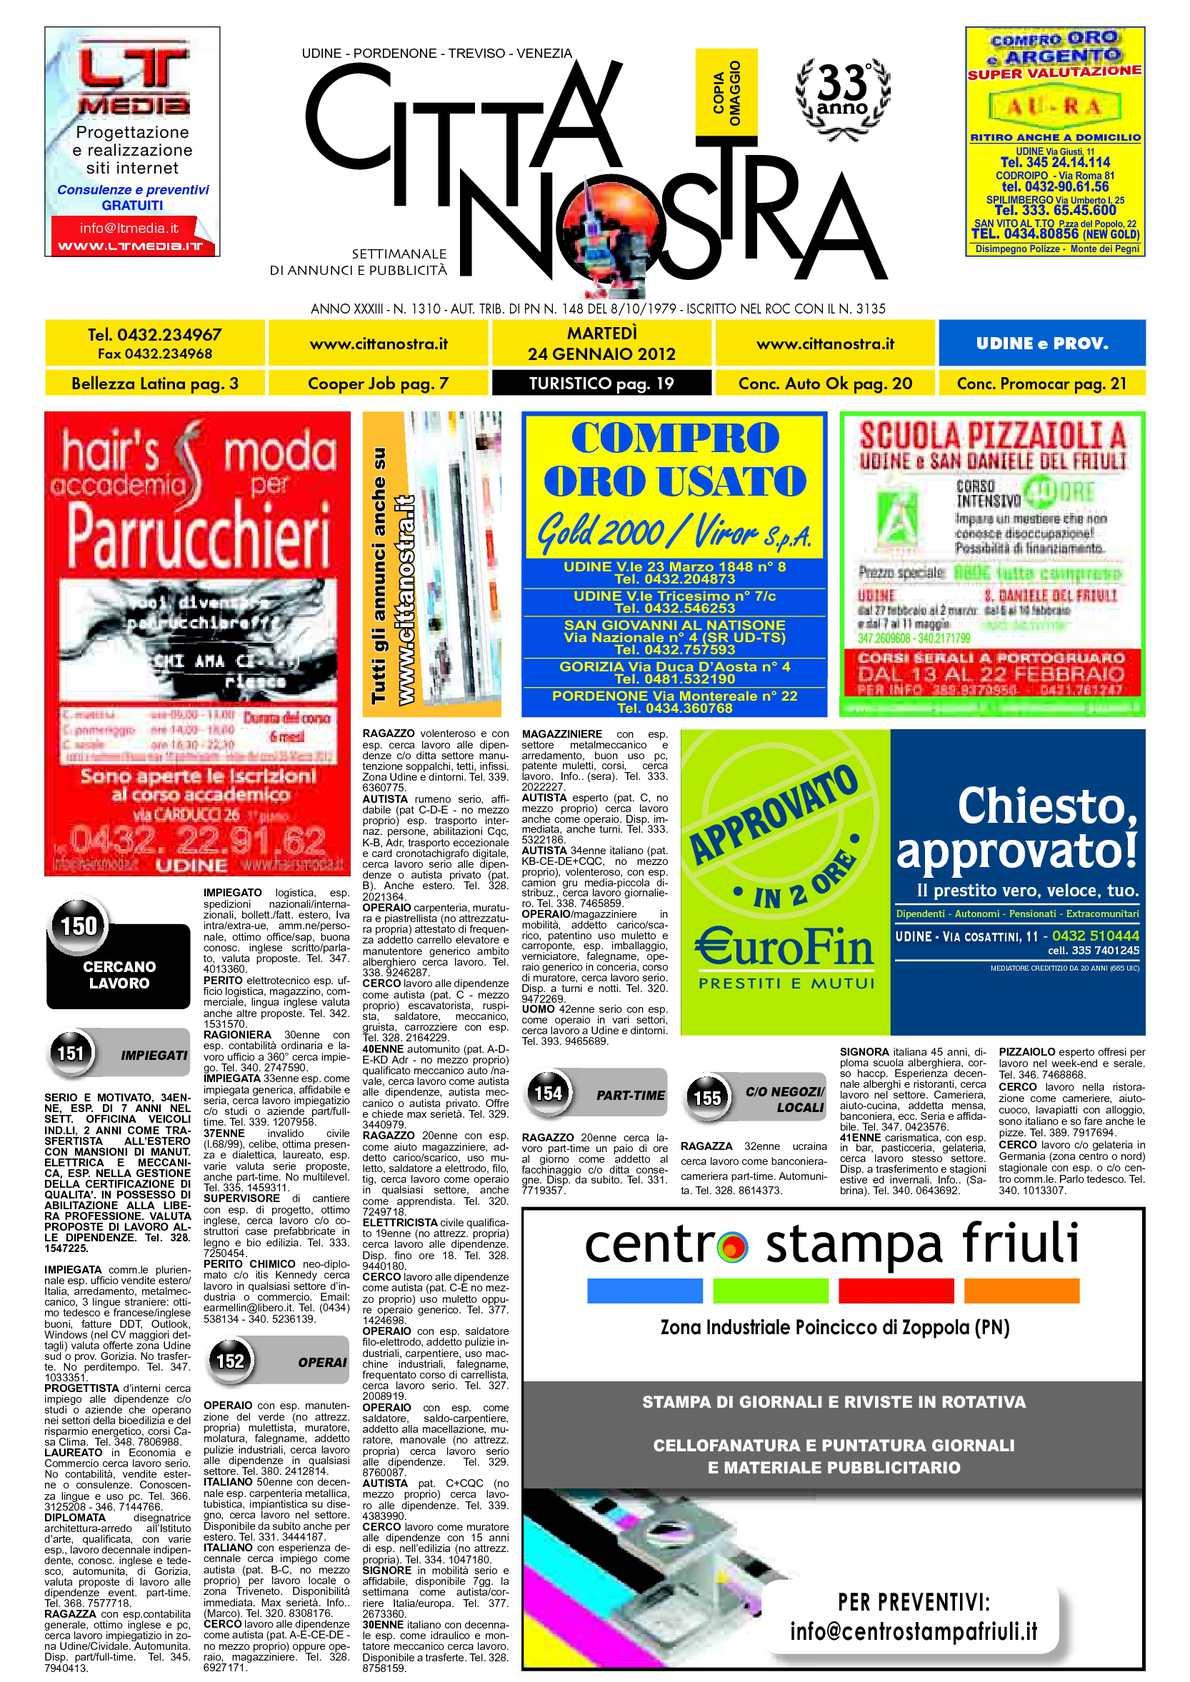 Calaméo Citt Nostra Udine Del 24 01 2012 N 1310